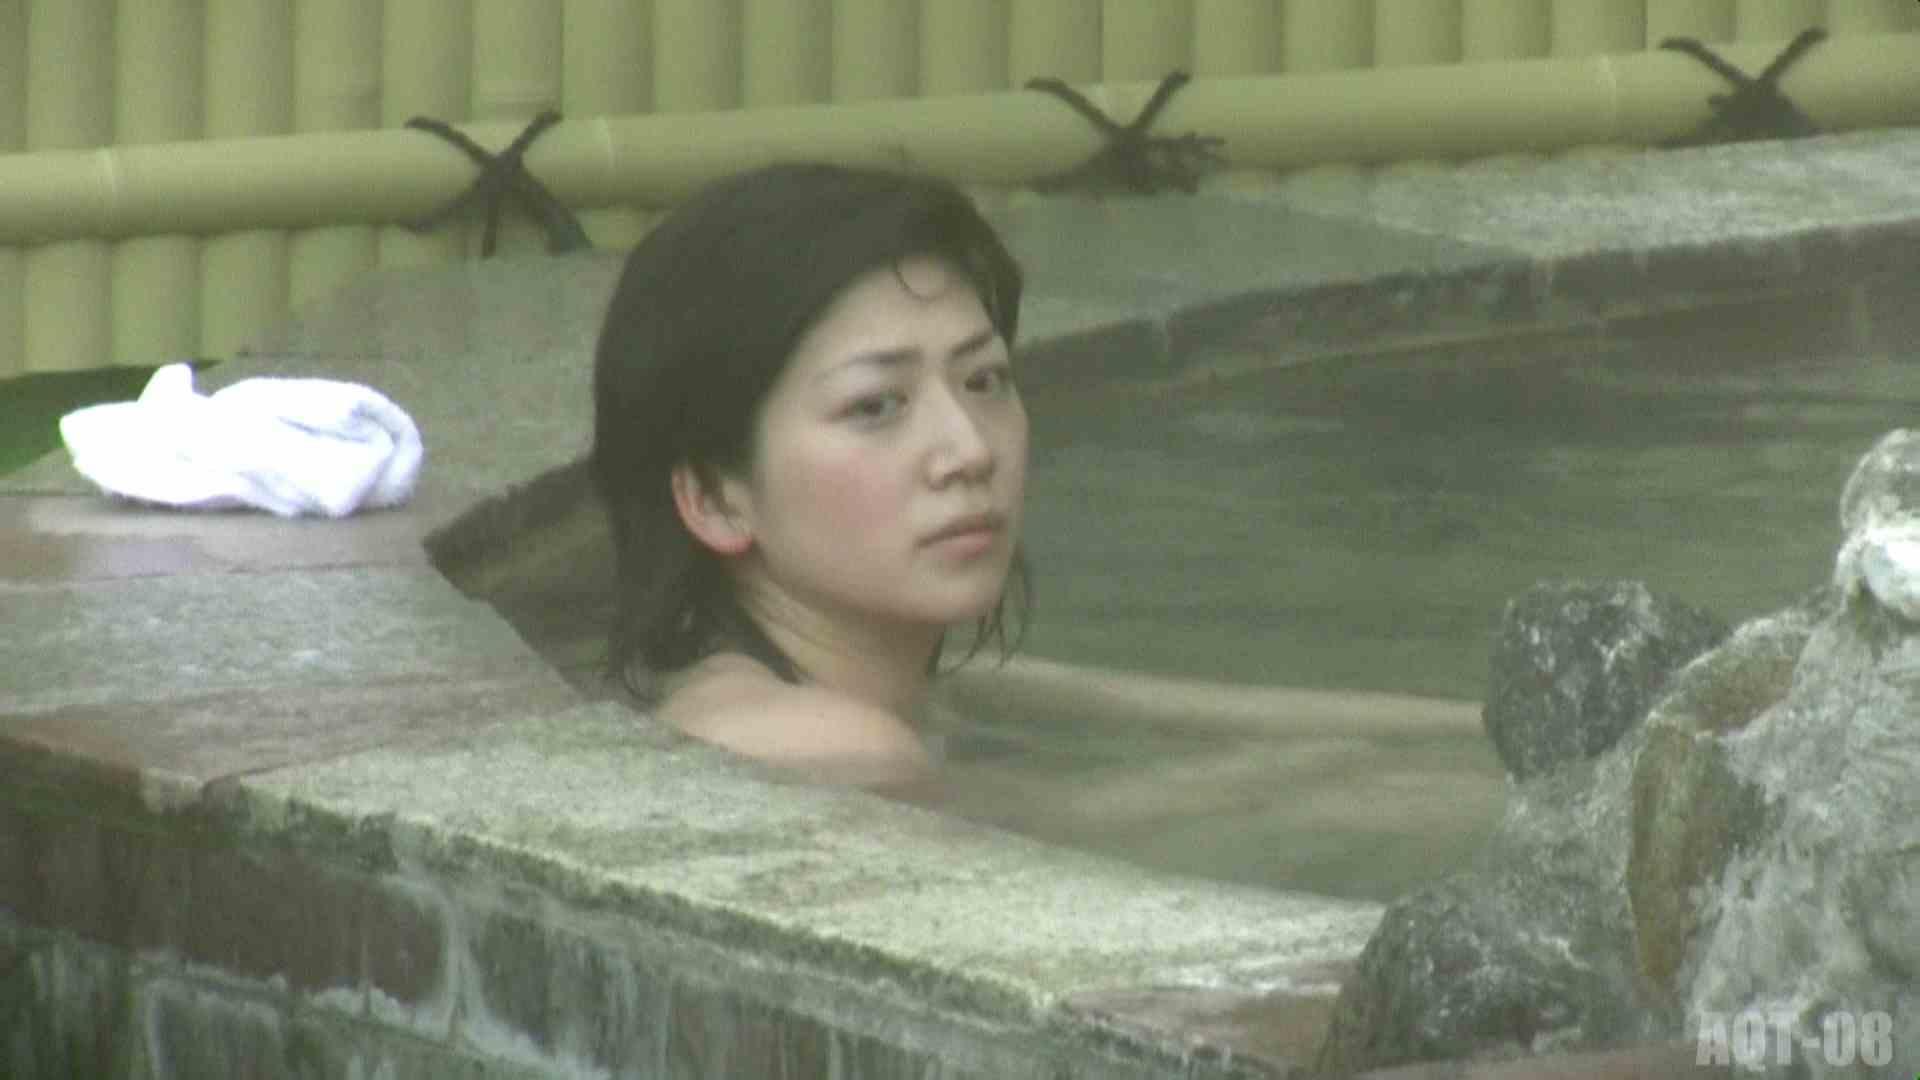 Aquaな露天風呂Vol.776 盗撮 エロ無料画像 108画像 95